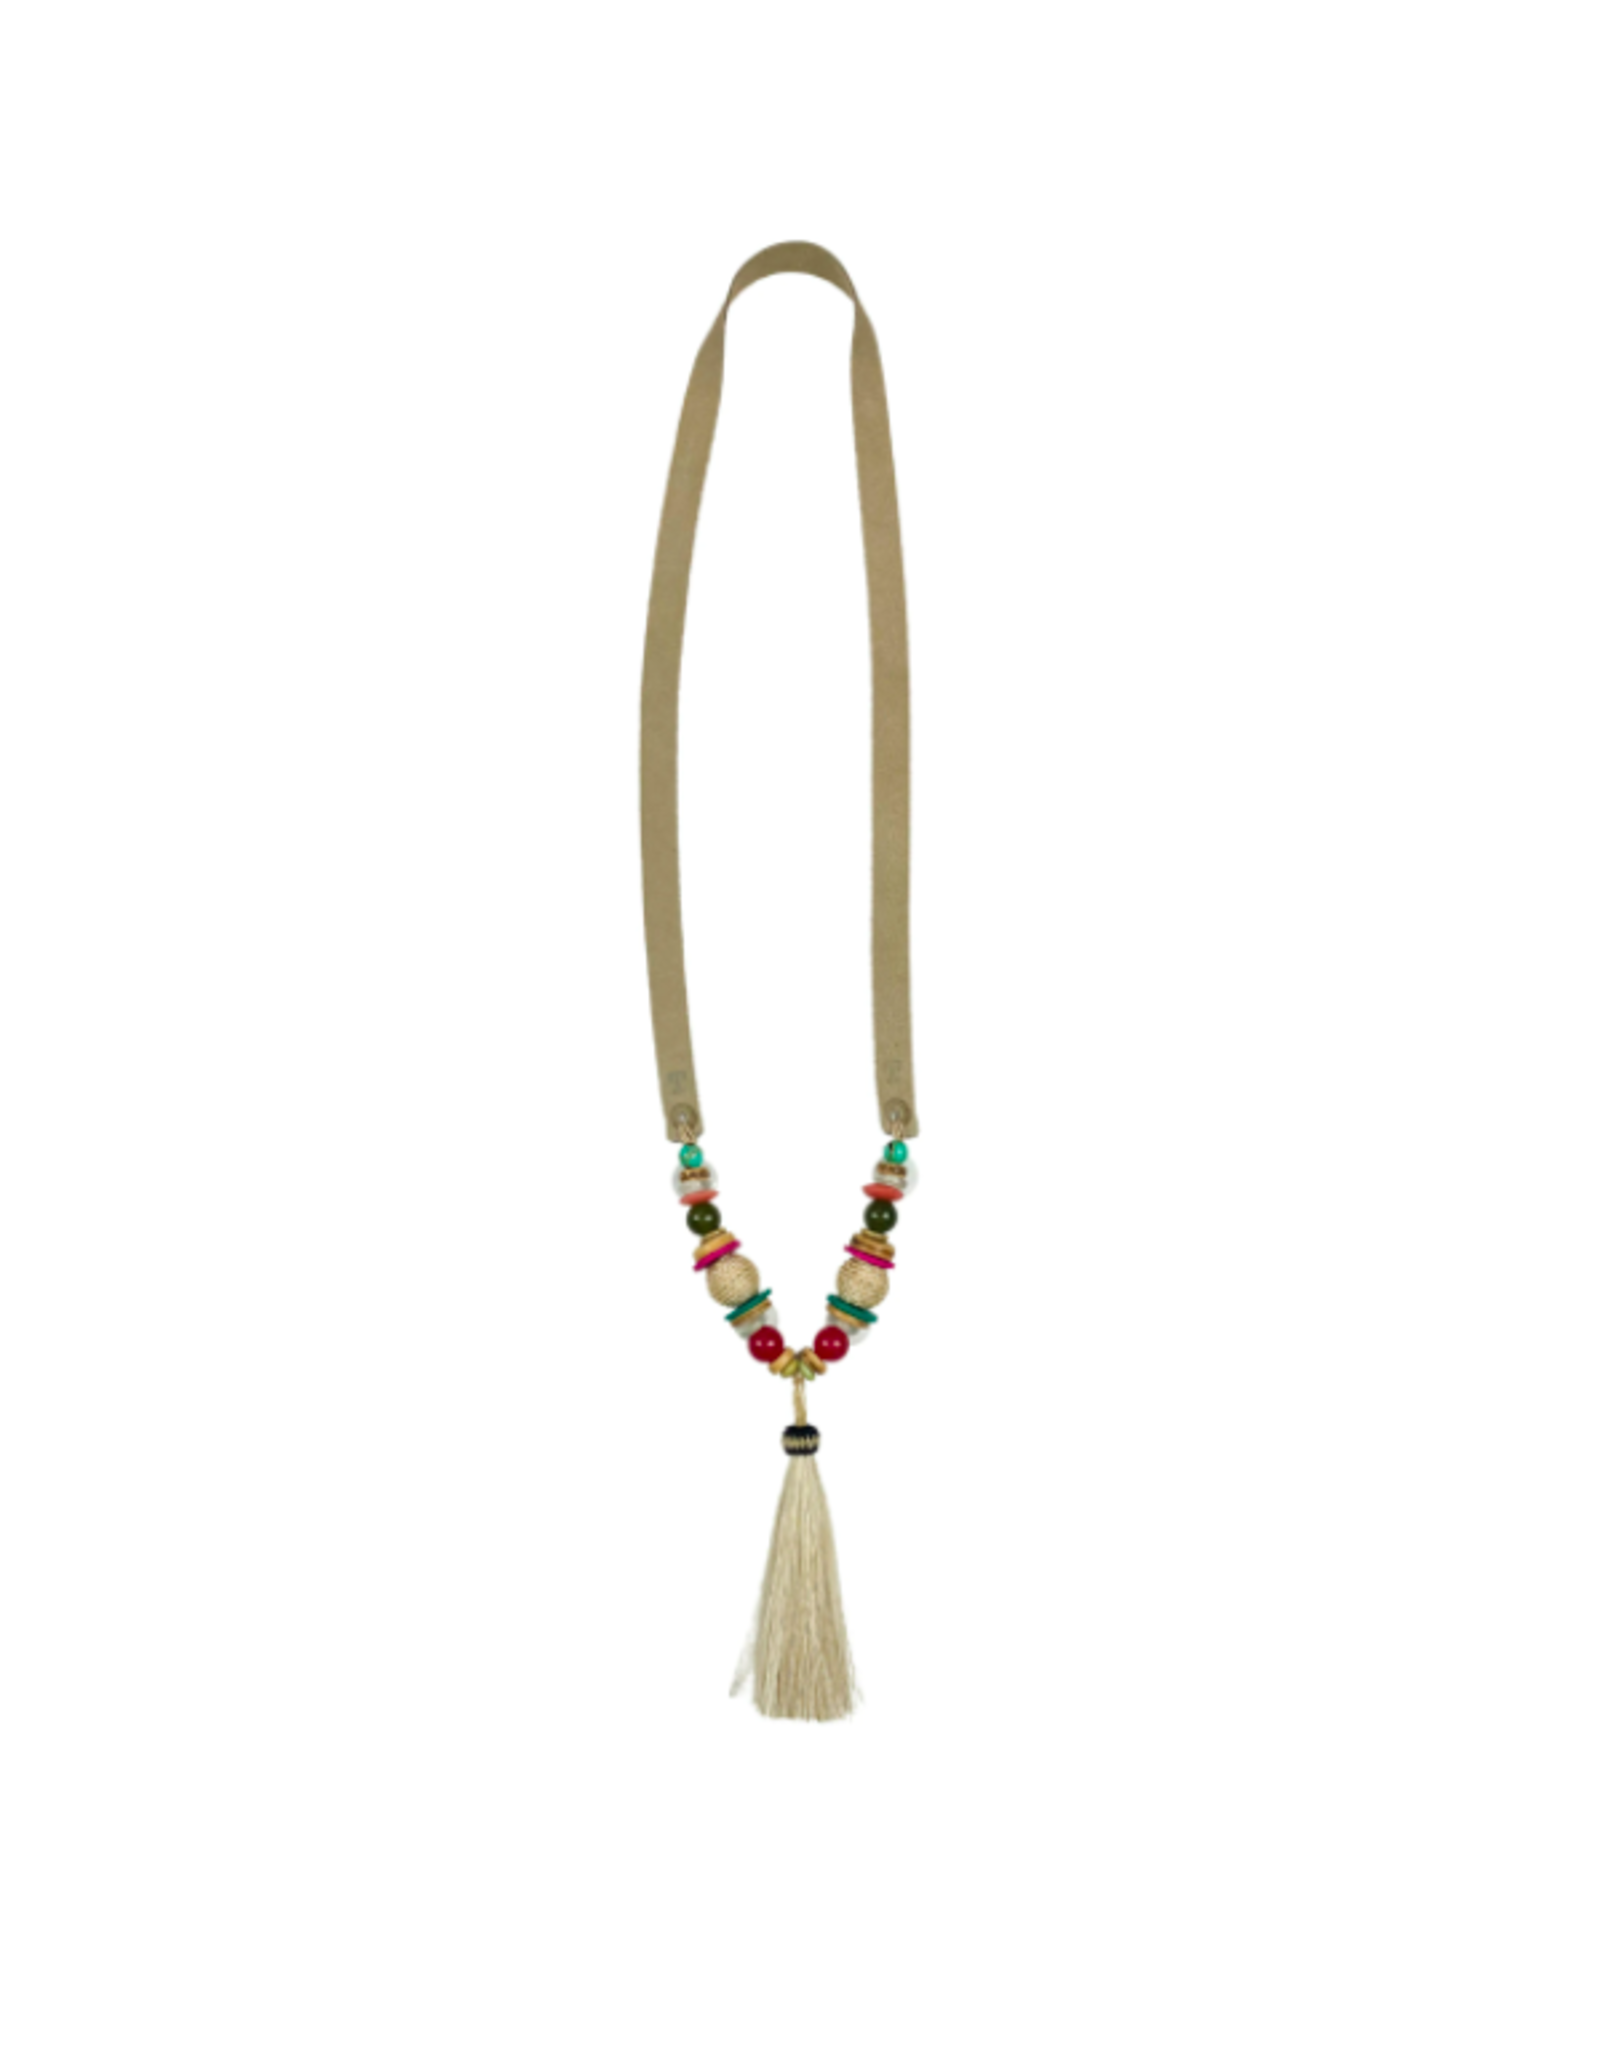 Twine & Twig Tassel Slim Horse Hair Necklace - Palm